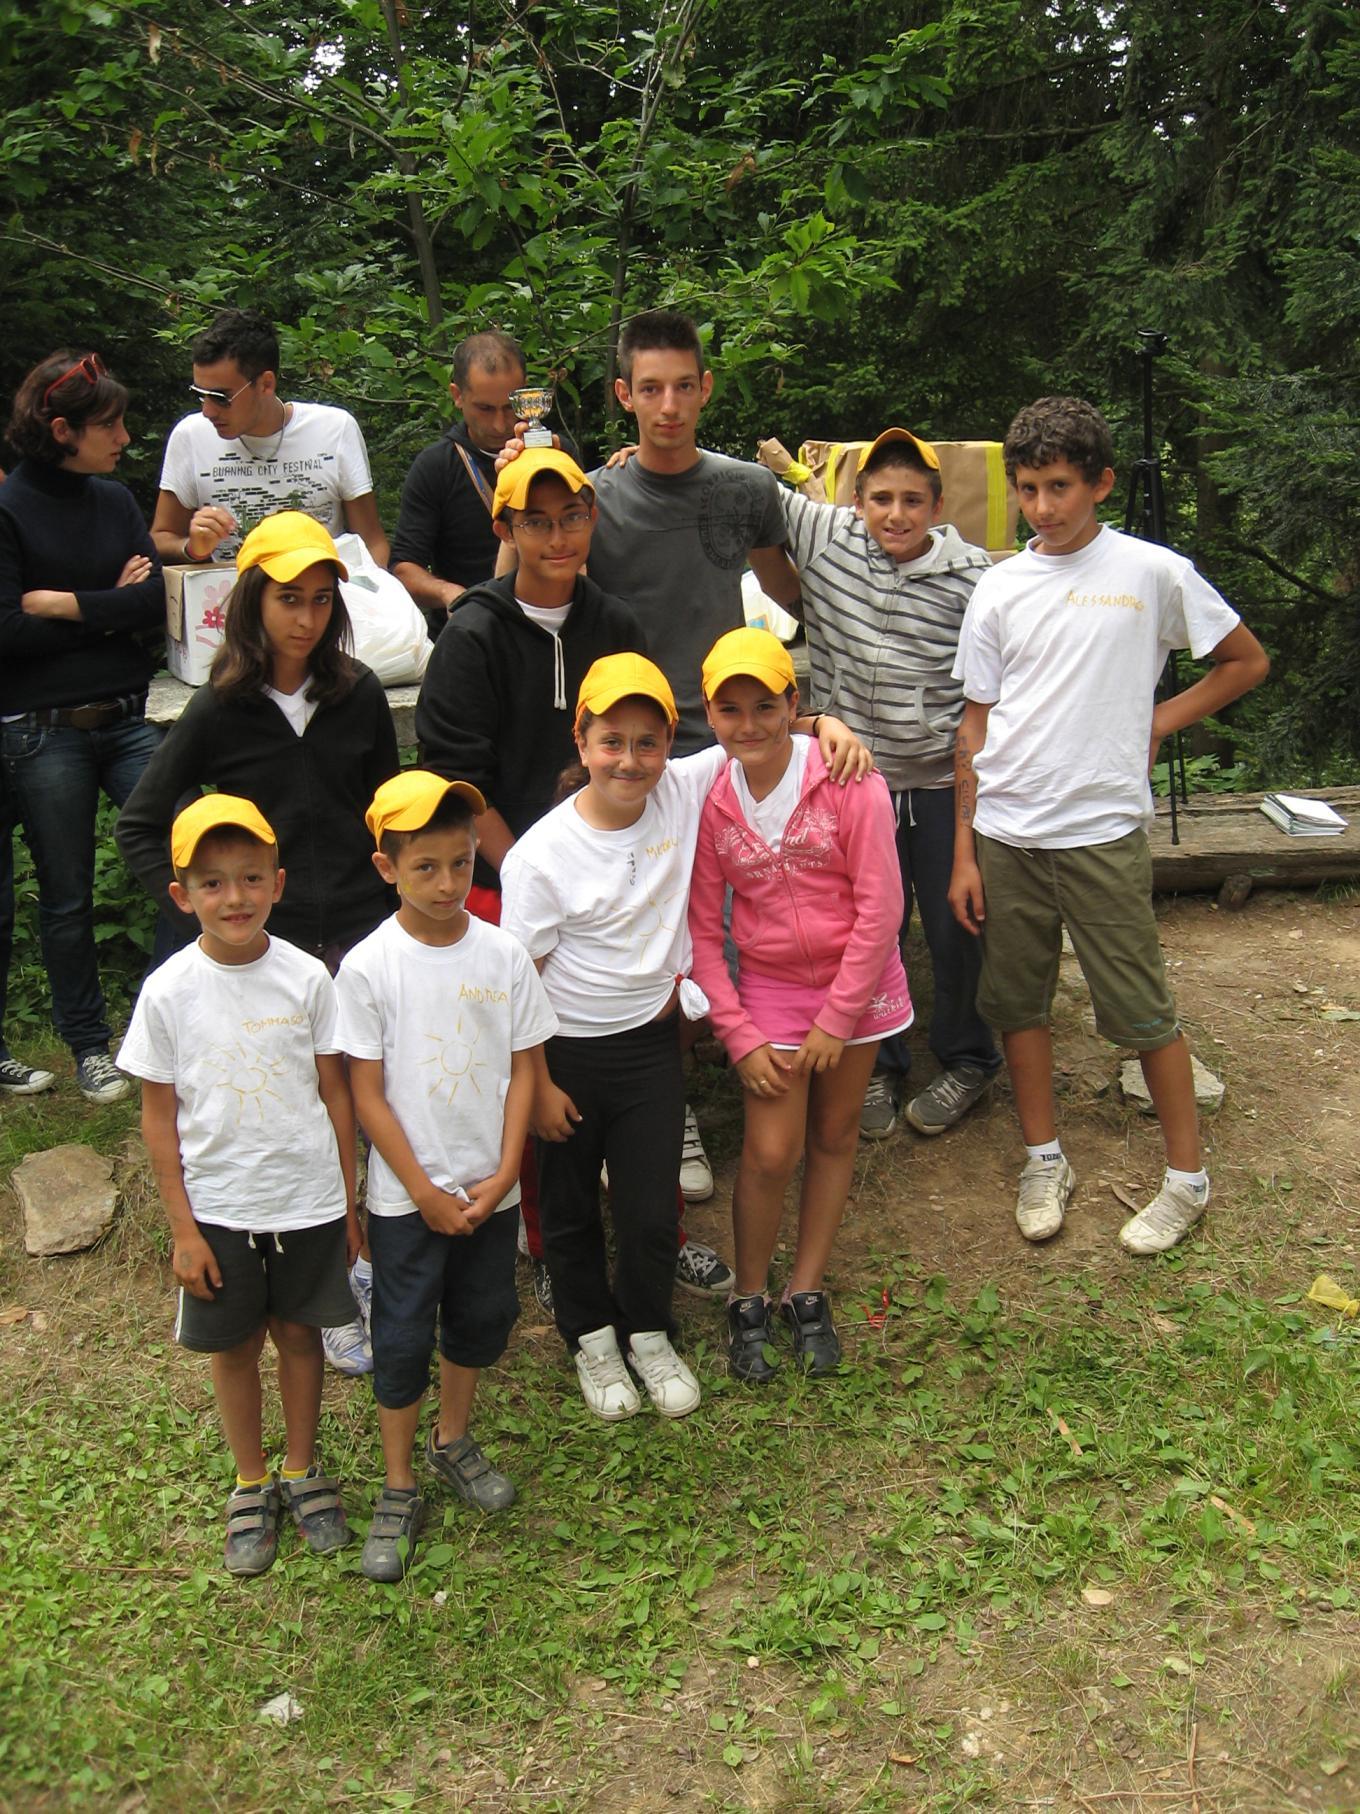 Campo_San_Giacomo_squadre-2009-07-12--12.11.09